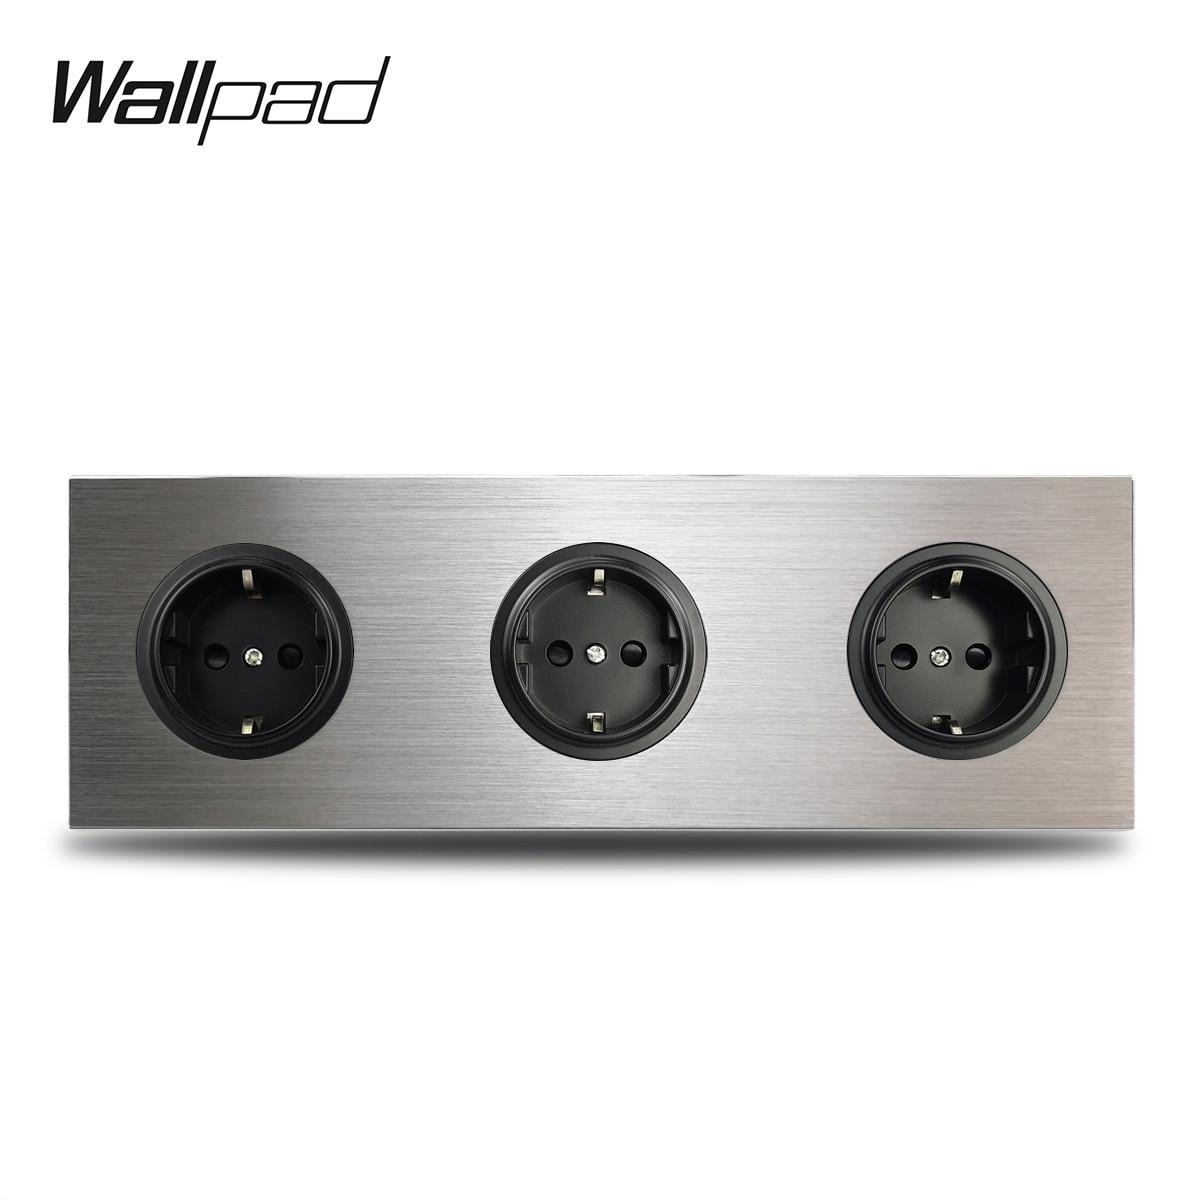 Wallpad 3 Gang Triple marco EU toma de corriente de pared enchufe alemán salida plateado aluminio cepillado Panel doble placa 172*86mm